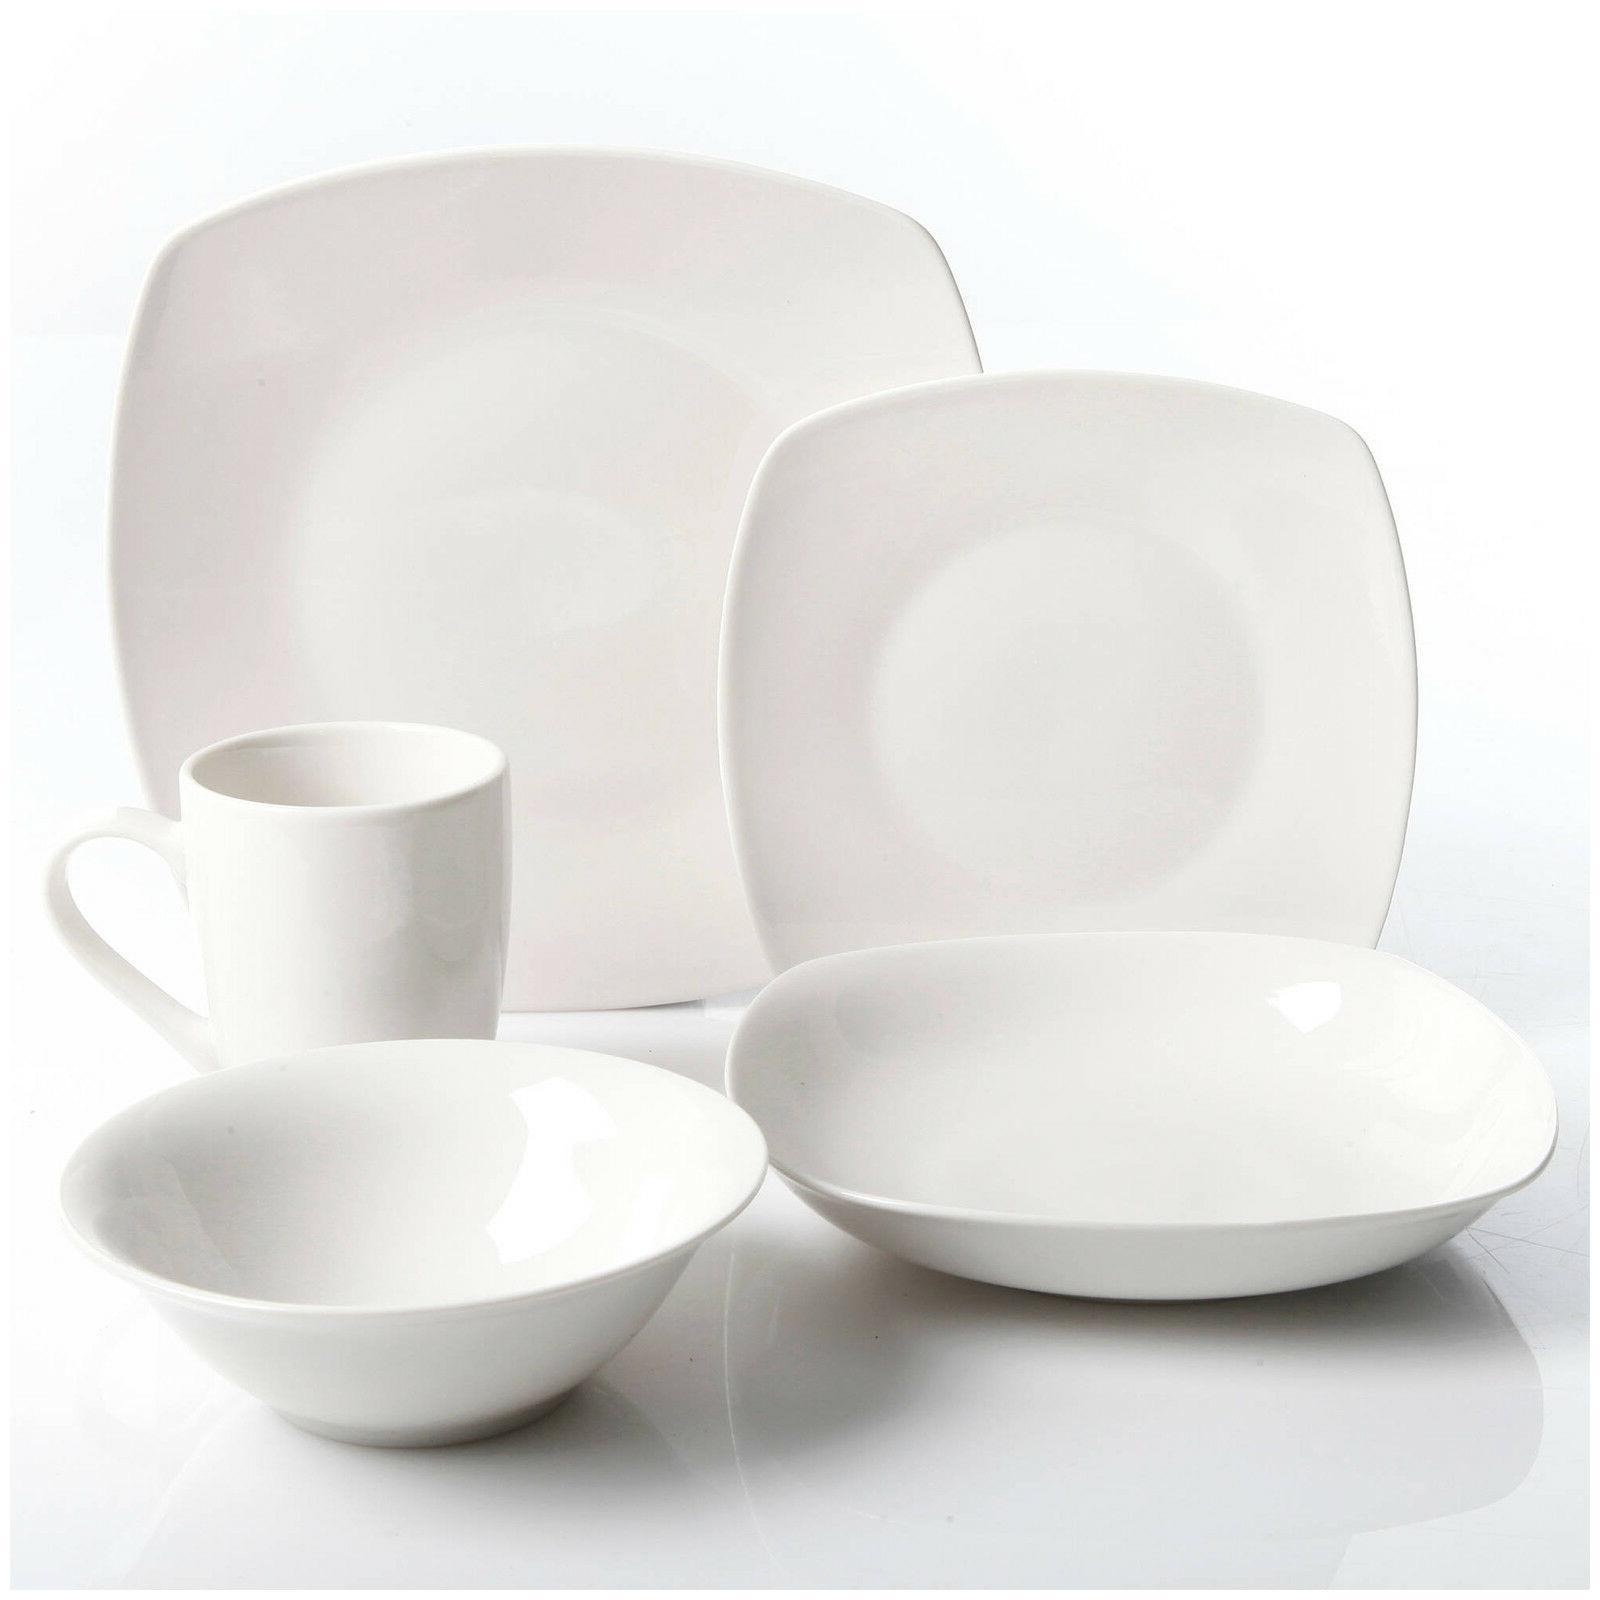 Porcelain Set For 6 White Kitchen Dishes